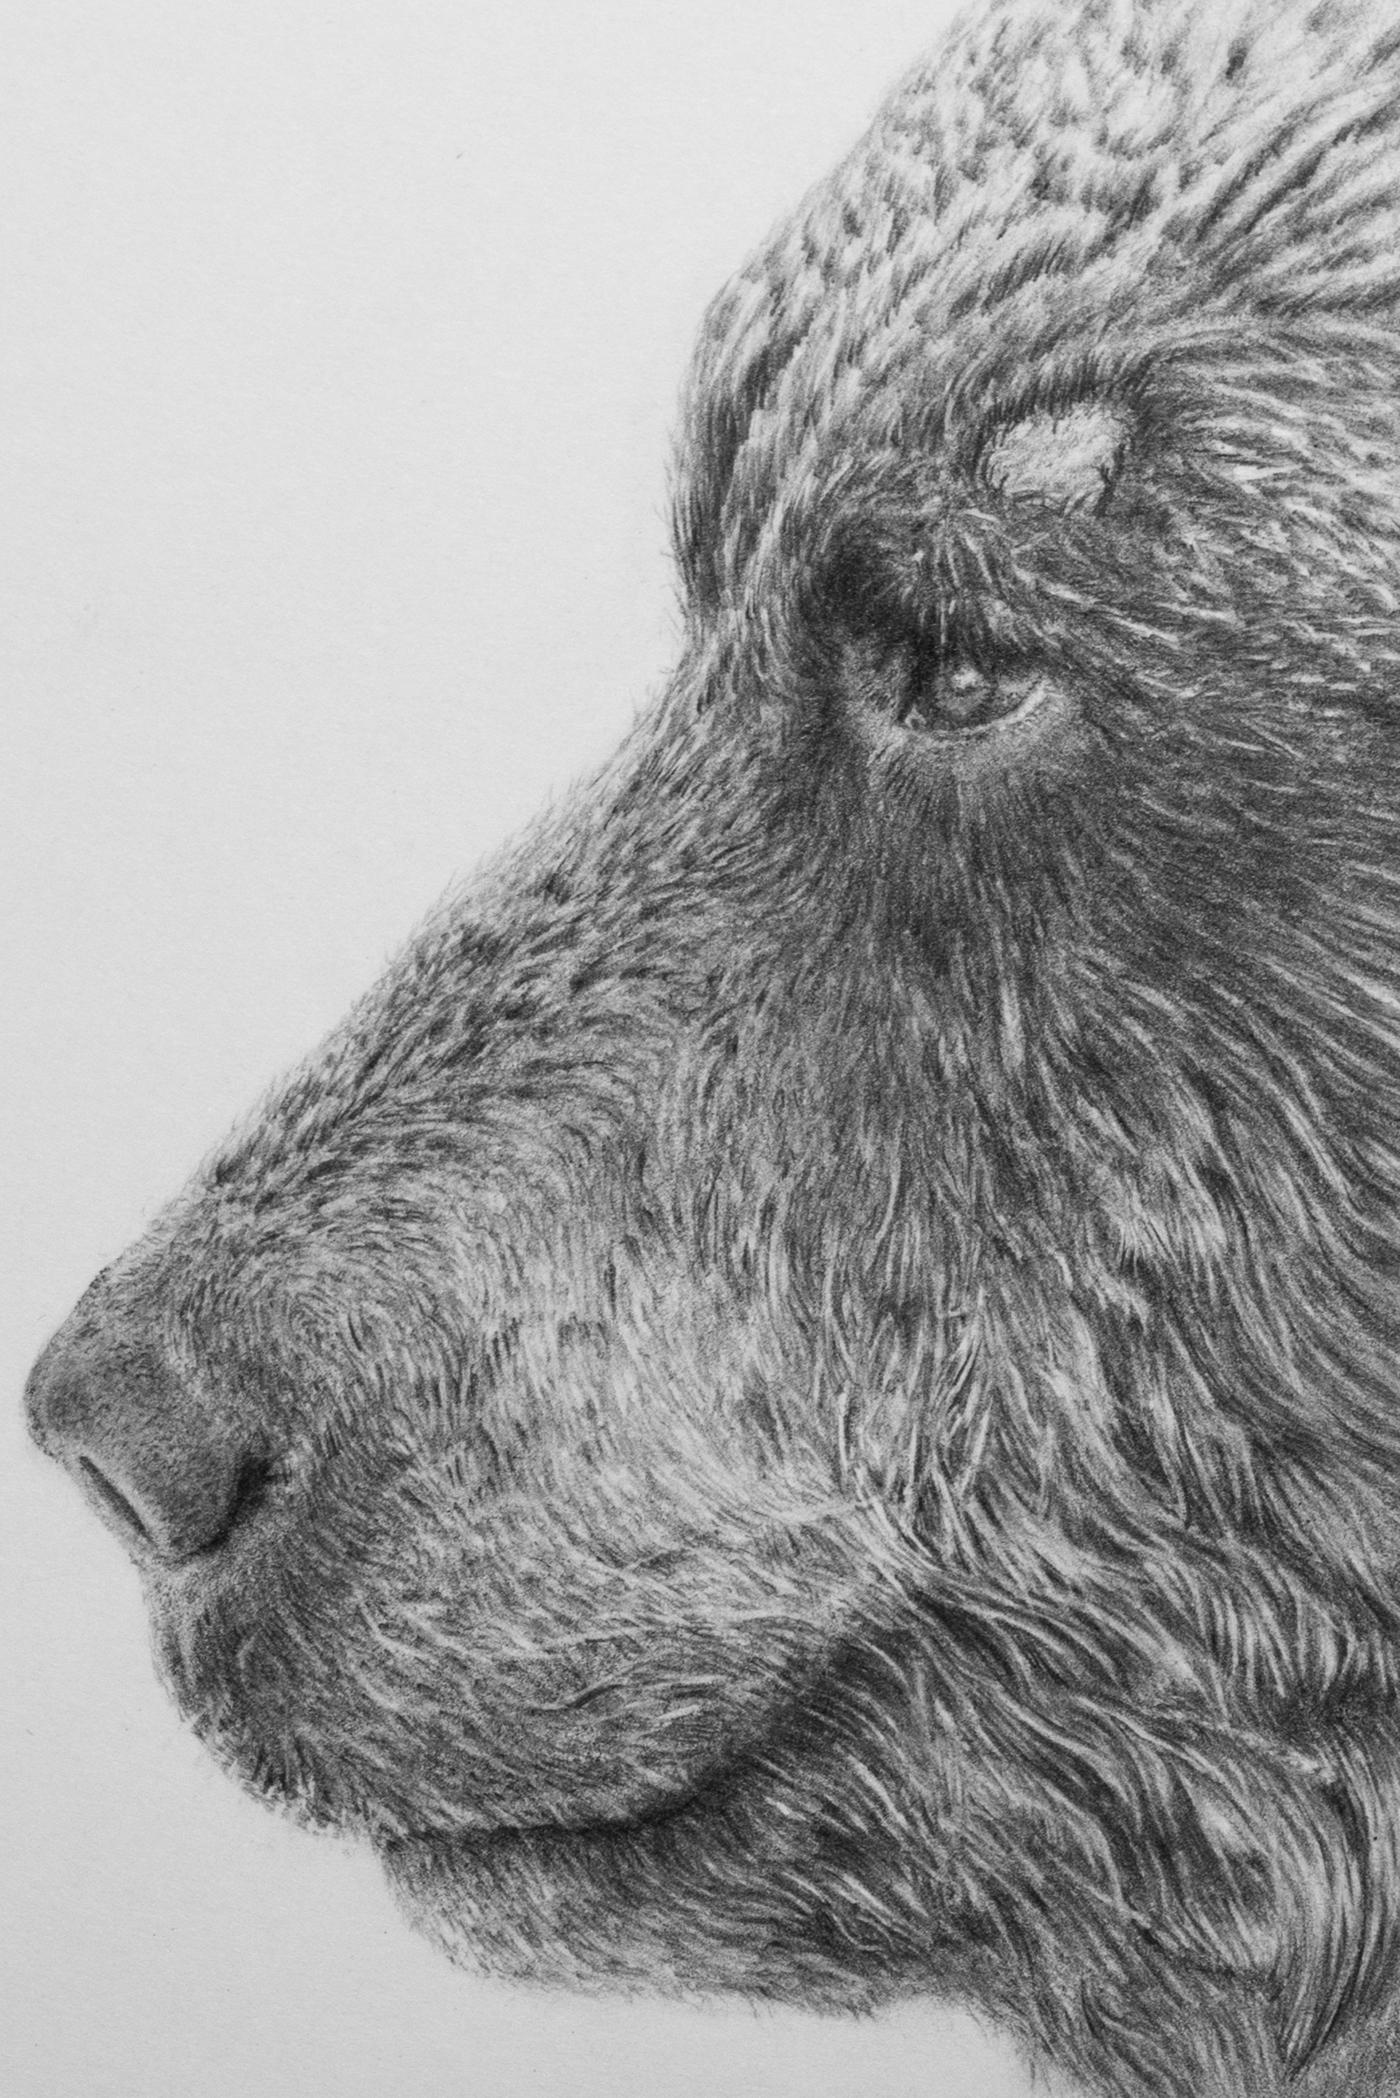 Pencildrawing ussuri brown bear on behance